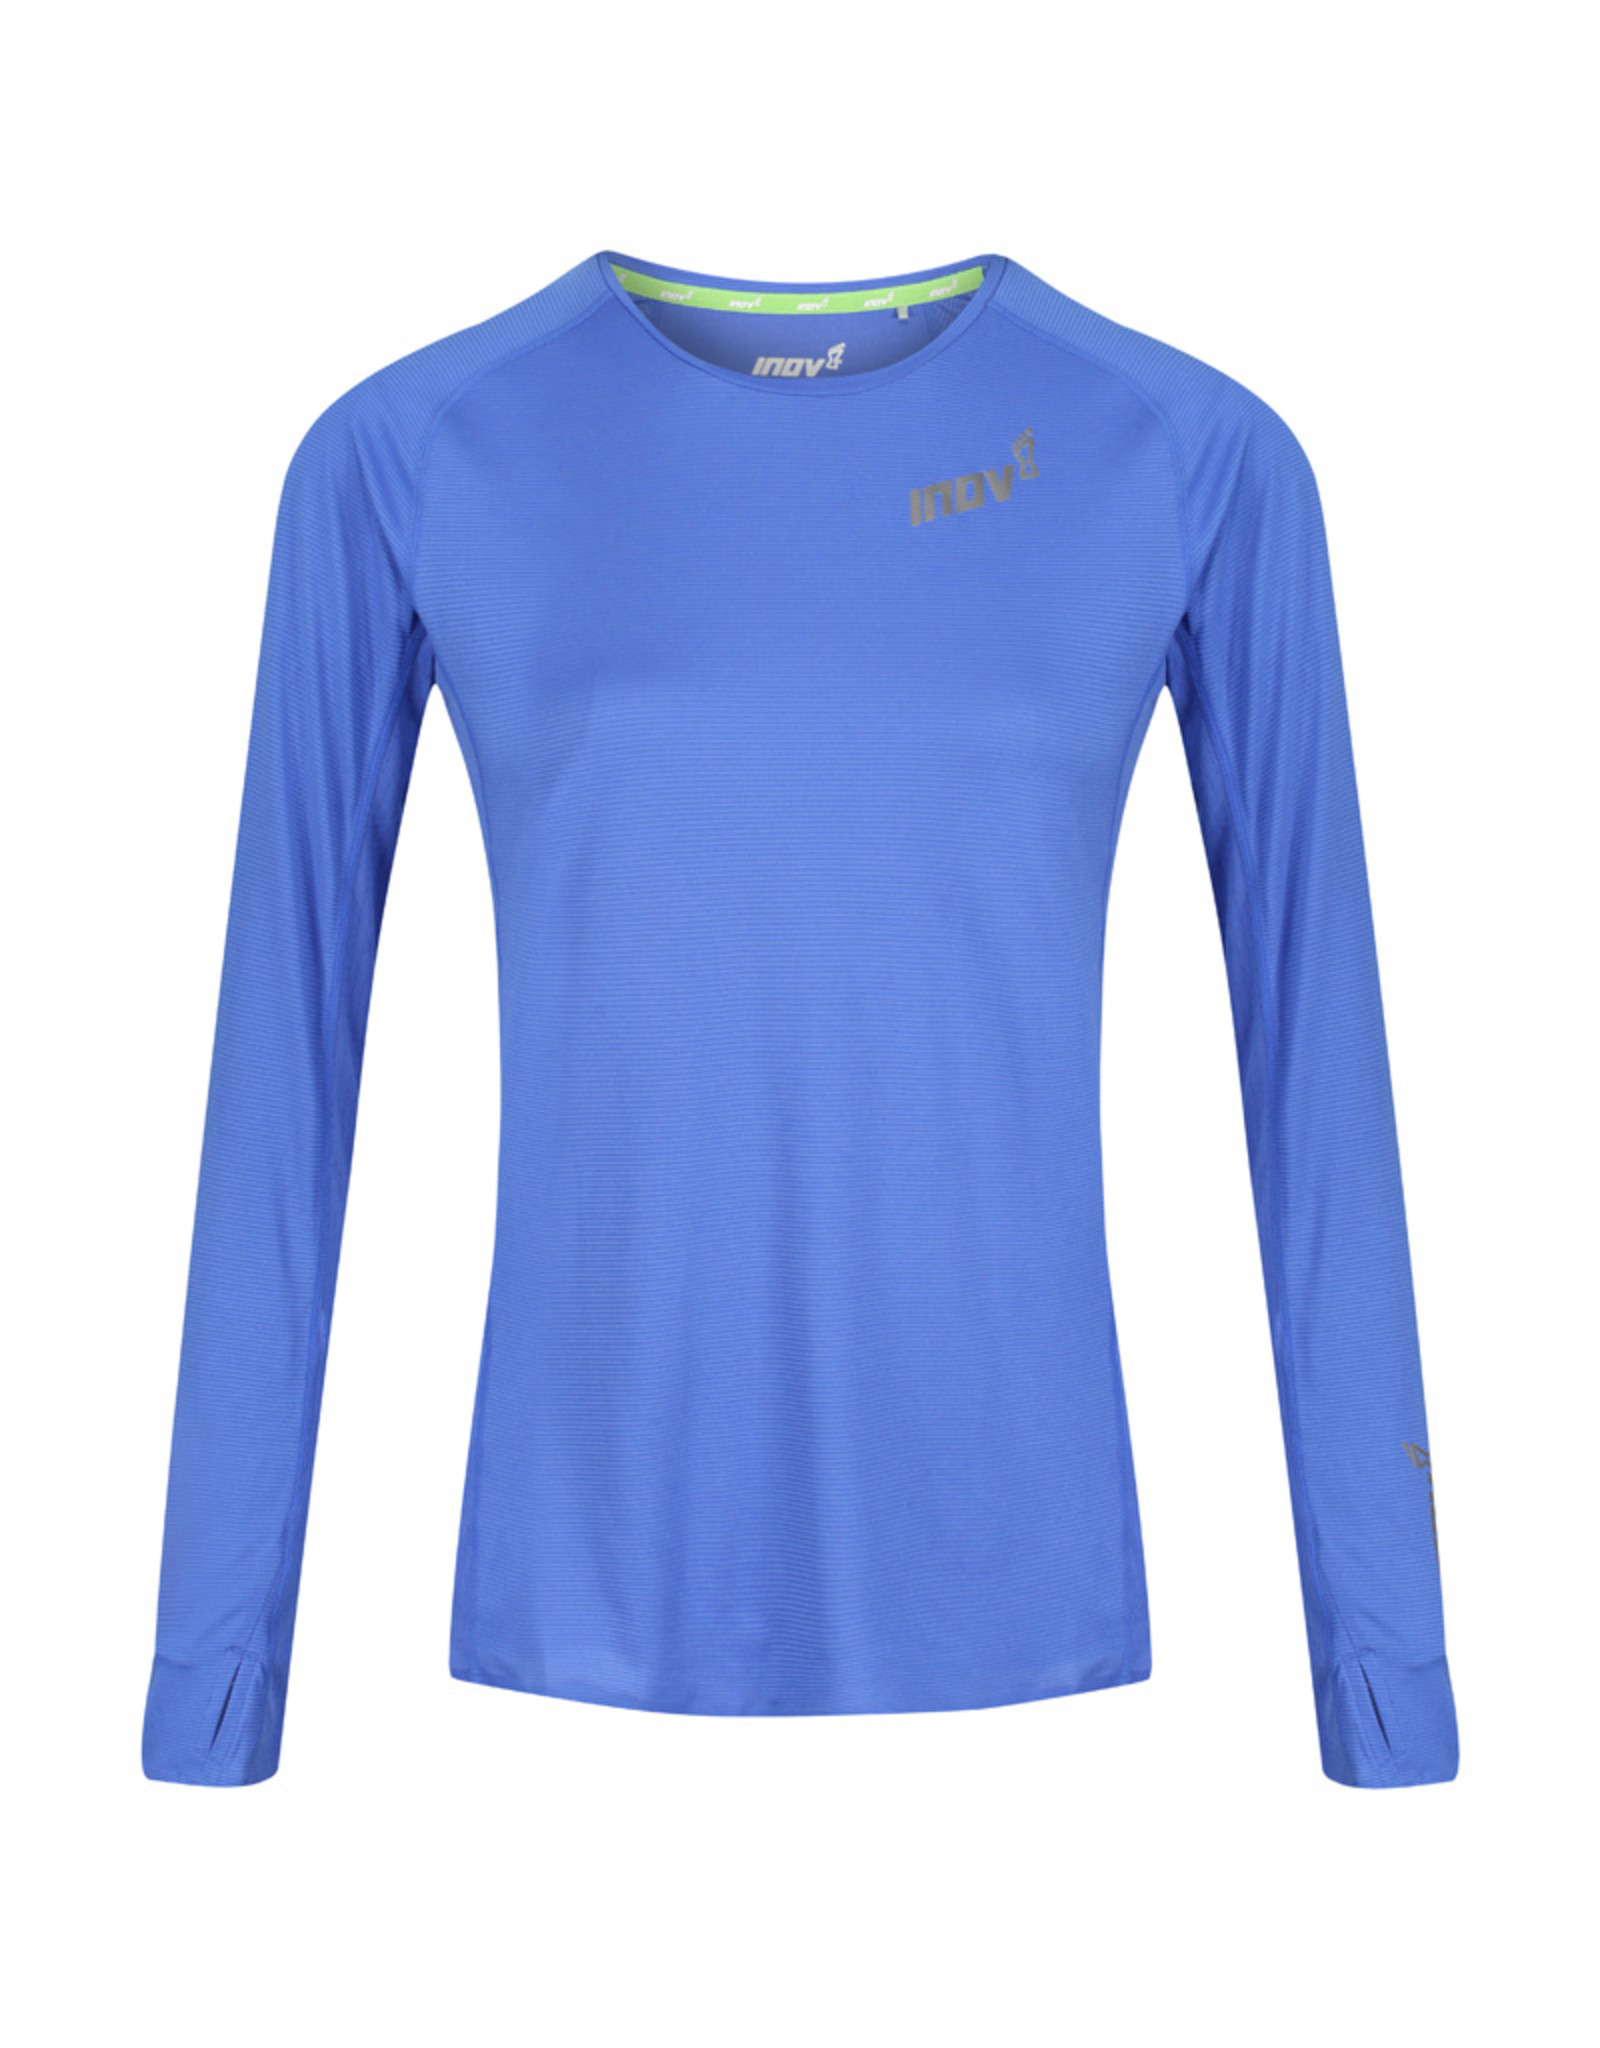 Inov-8 Base Elite Shirt Manche Longue  - Bleu